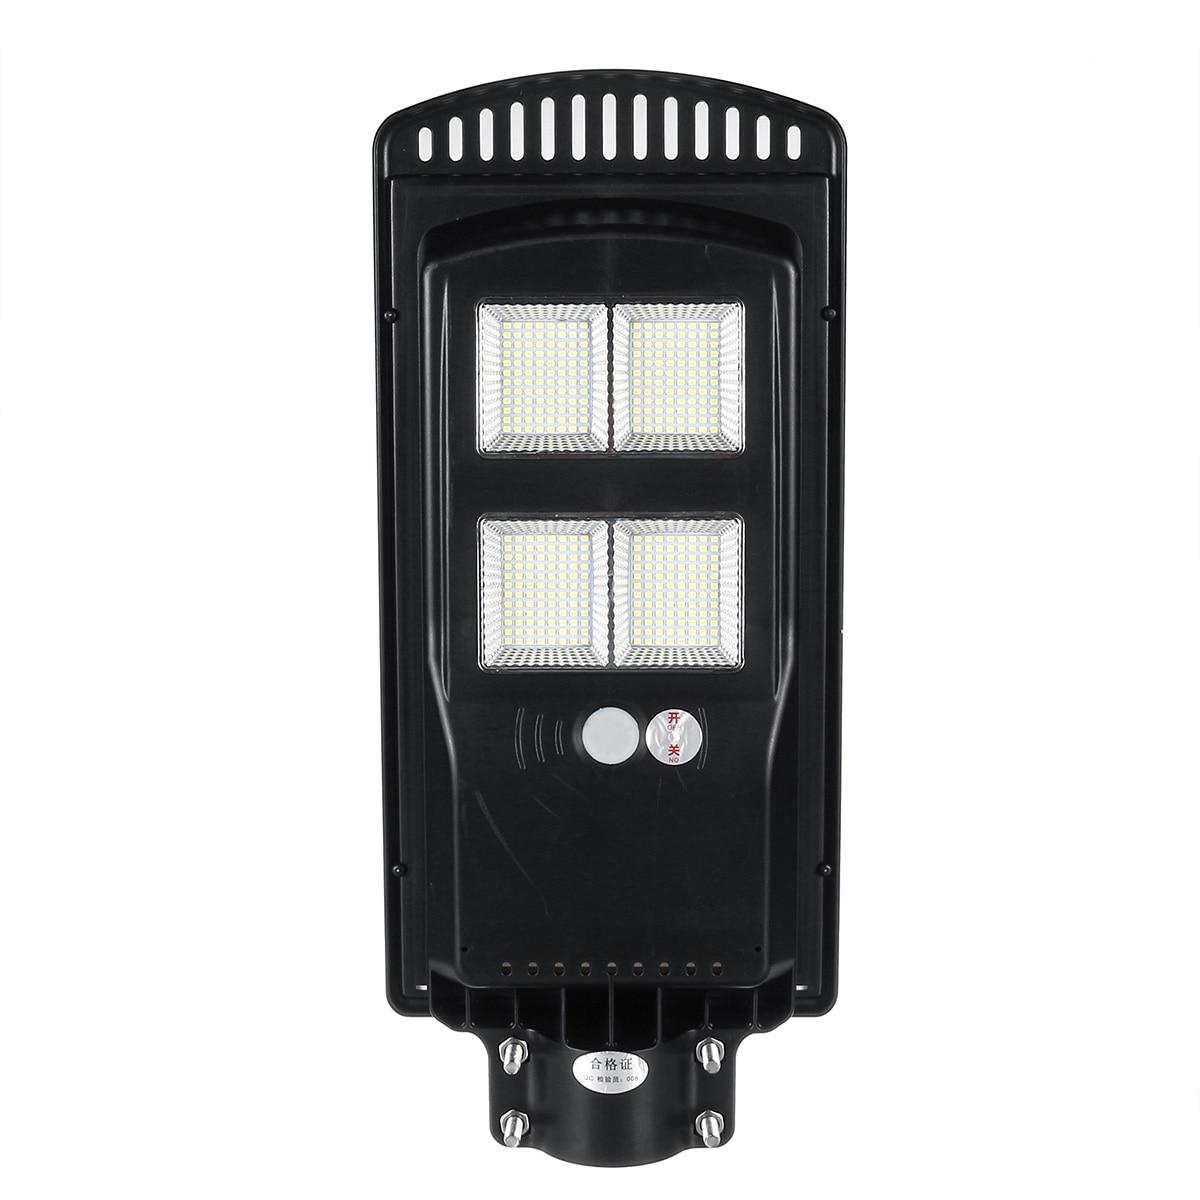 80W 140W 180W LED Solar Street Light Outdoor Solar Wall Lamp Radar+PIR Human Induction Solar Waterproof Landscape Light